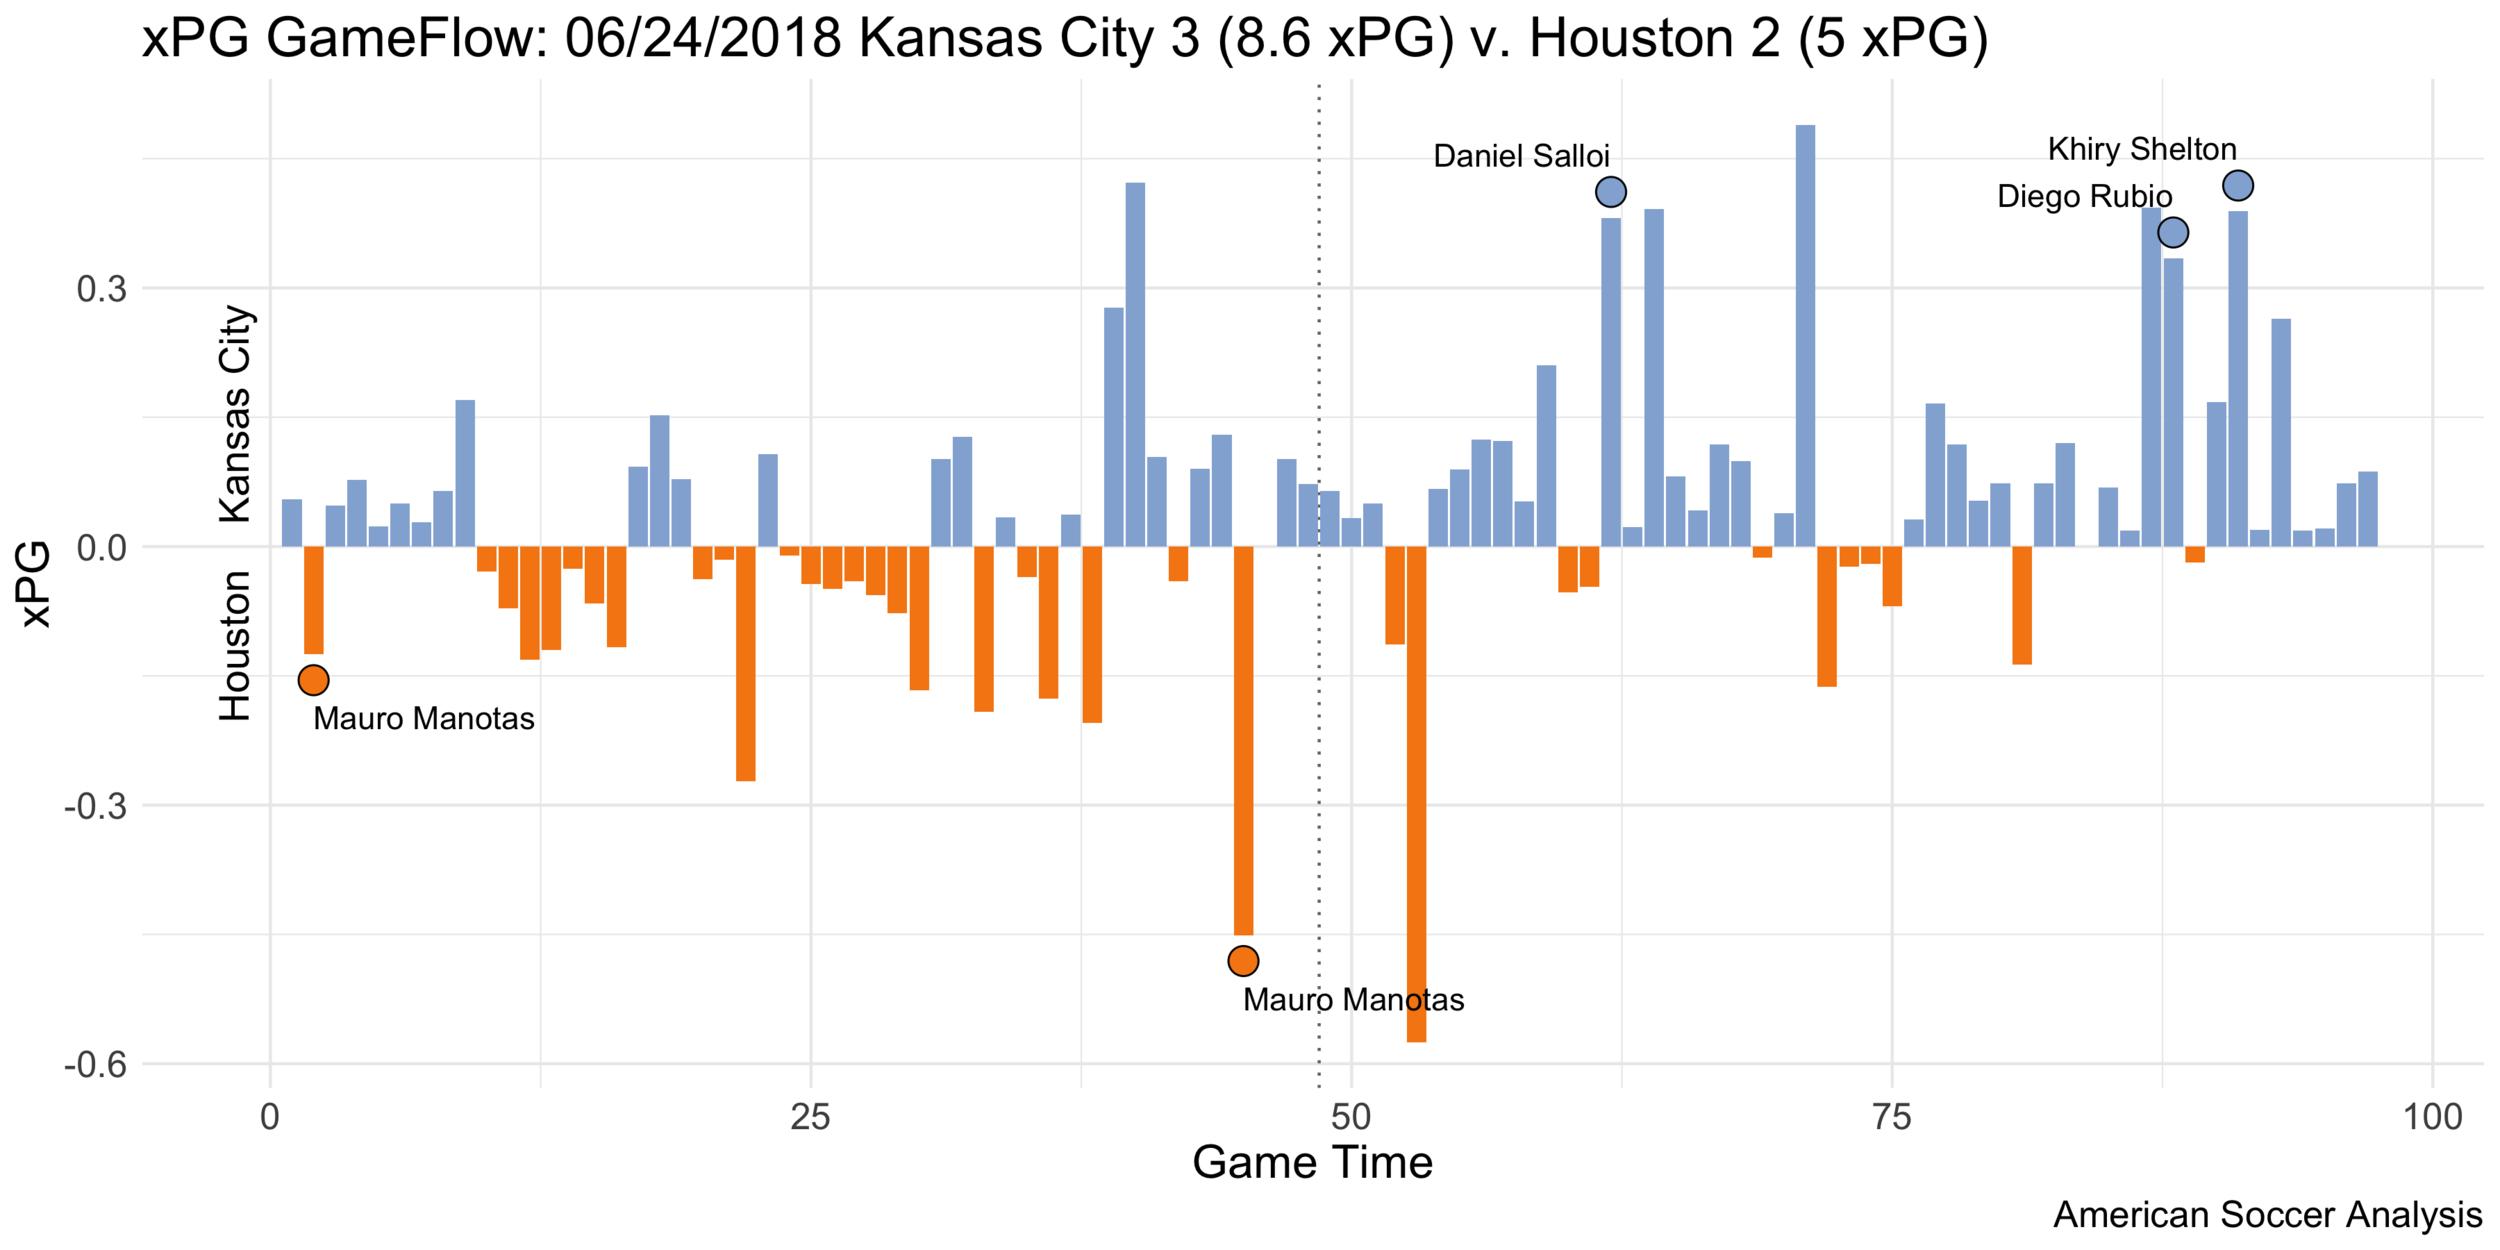 06-24-2018 xPG Game Flow 06-24-2018 Kansas City v Houston.png